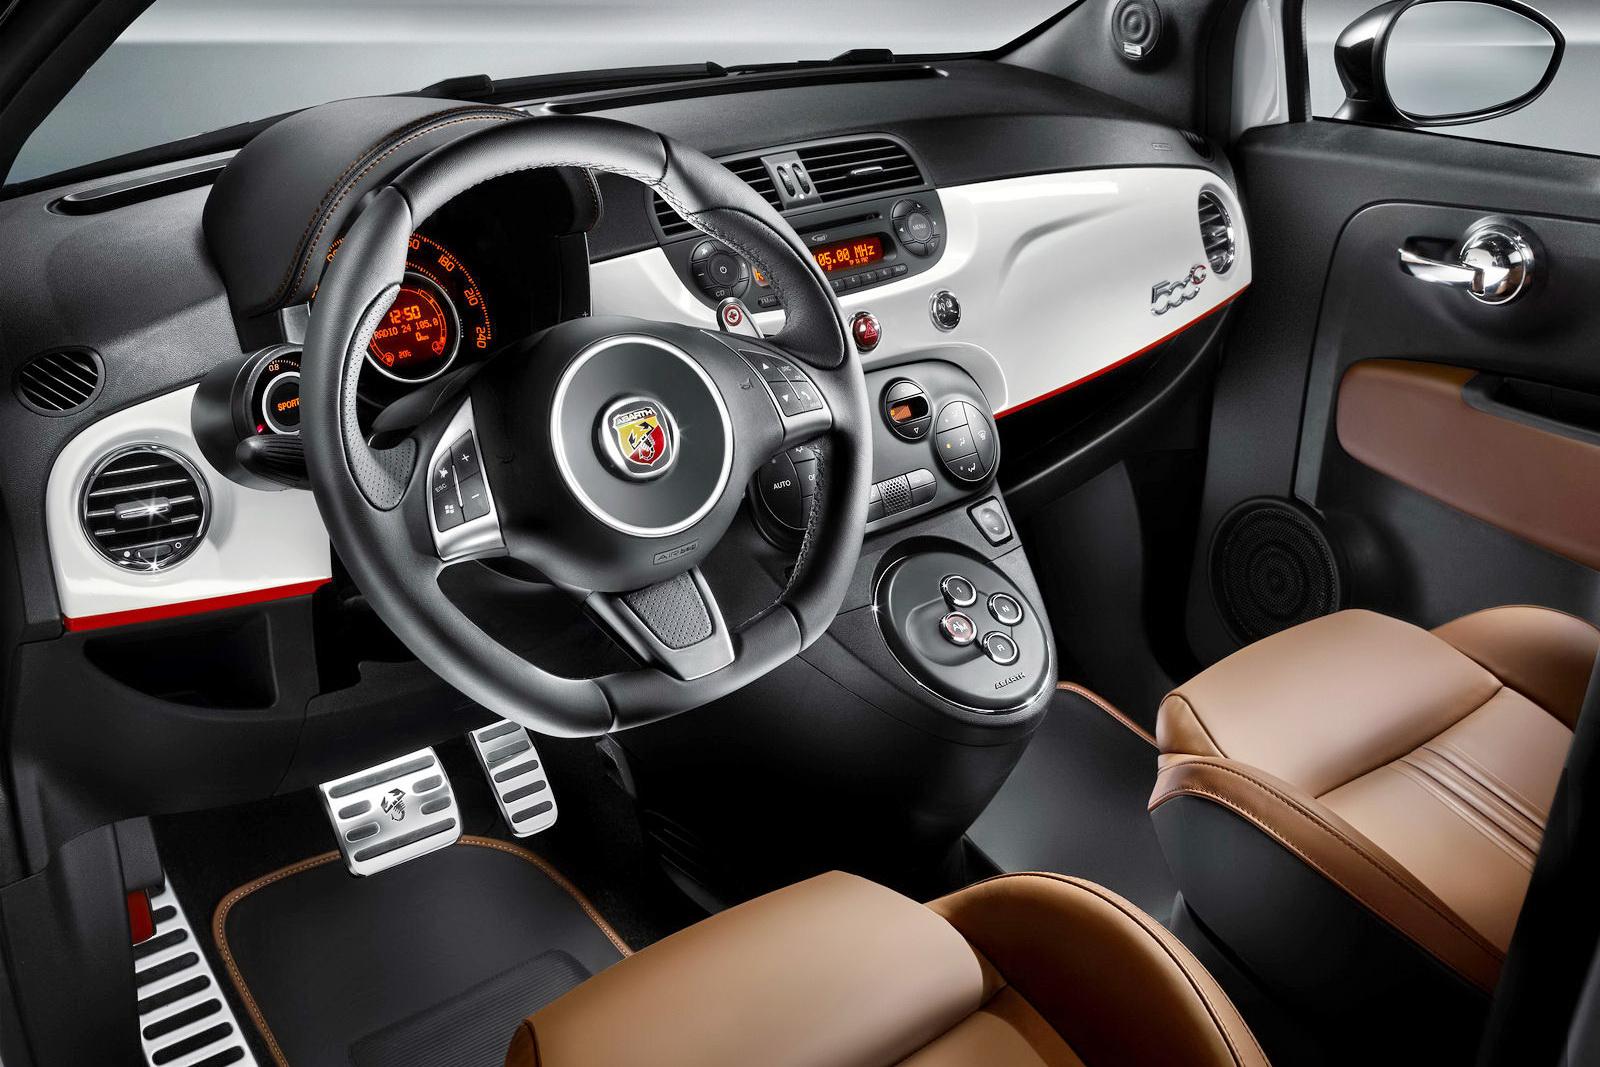 http://2.bp.blogspot.com/_FoXyvaPSnVk/TBfMoZJ7xII/AAAAAAAC9yg/tX4K2VGdfw0/s1600/Fiat-Abarth-500C-54.jpg